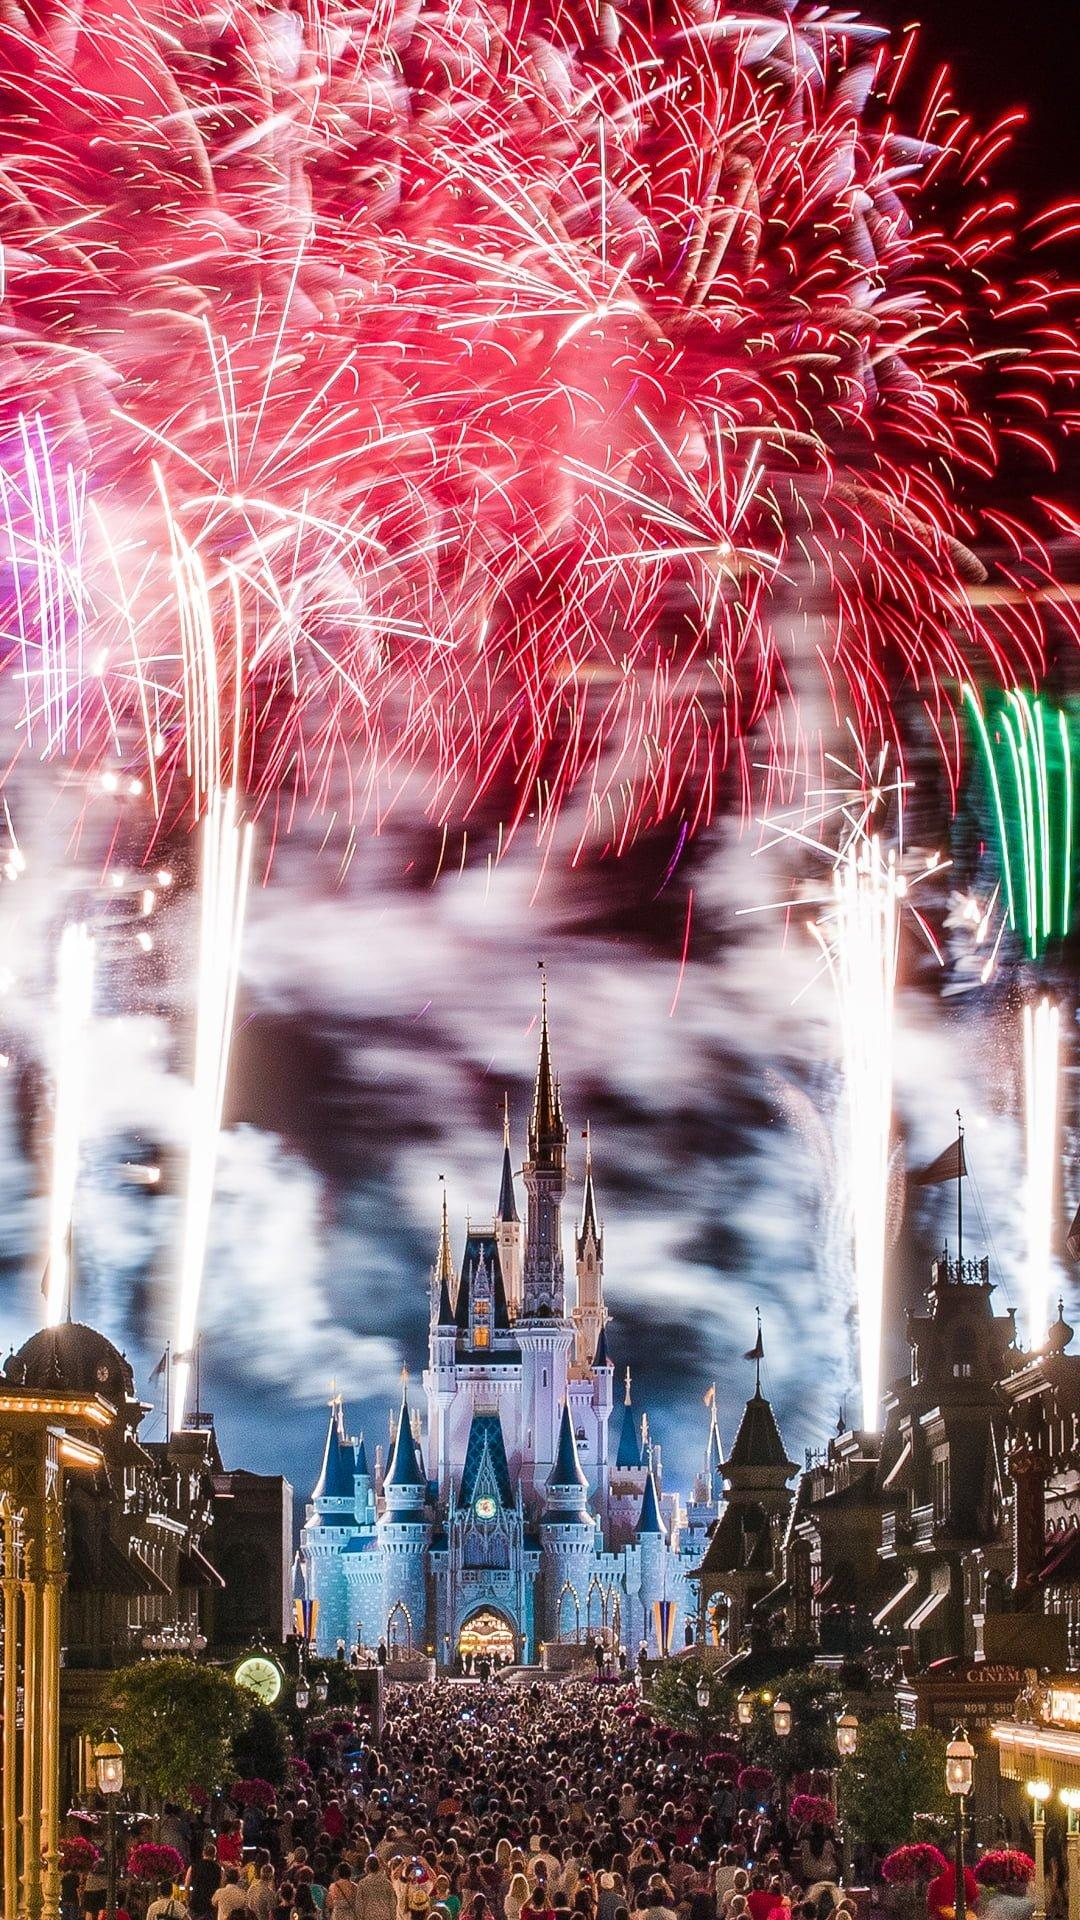 Disney games online for free